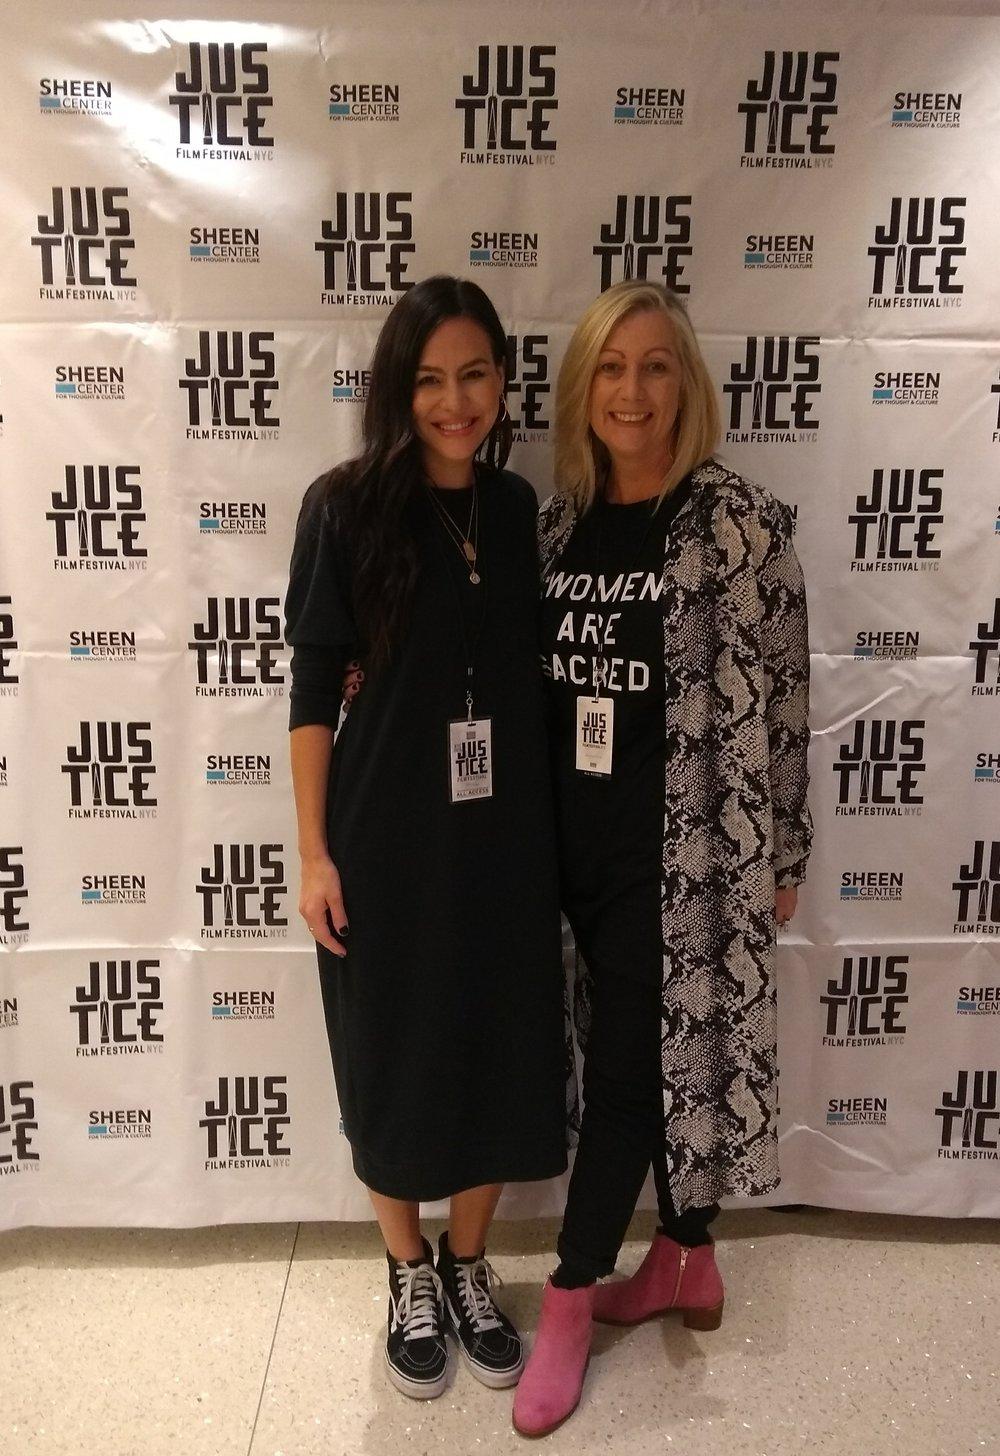 Caroline McGraw - Justice Film Festival NYC.jpg